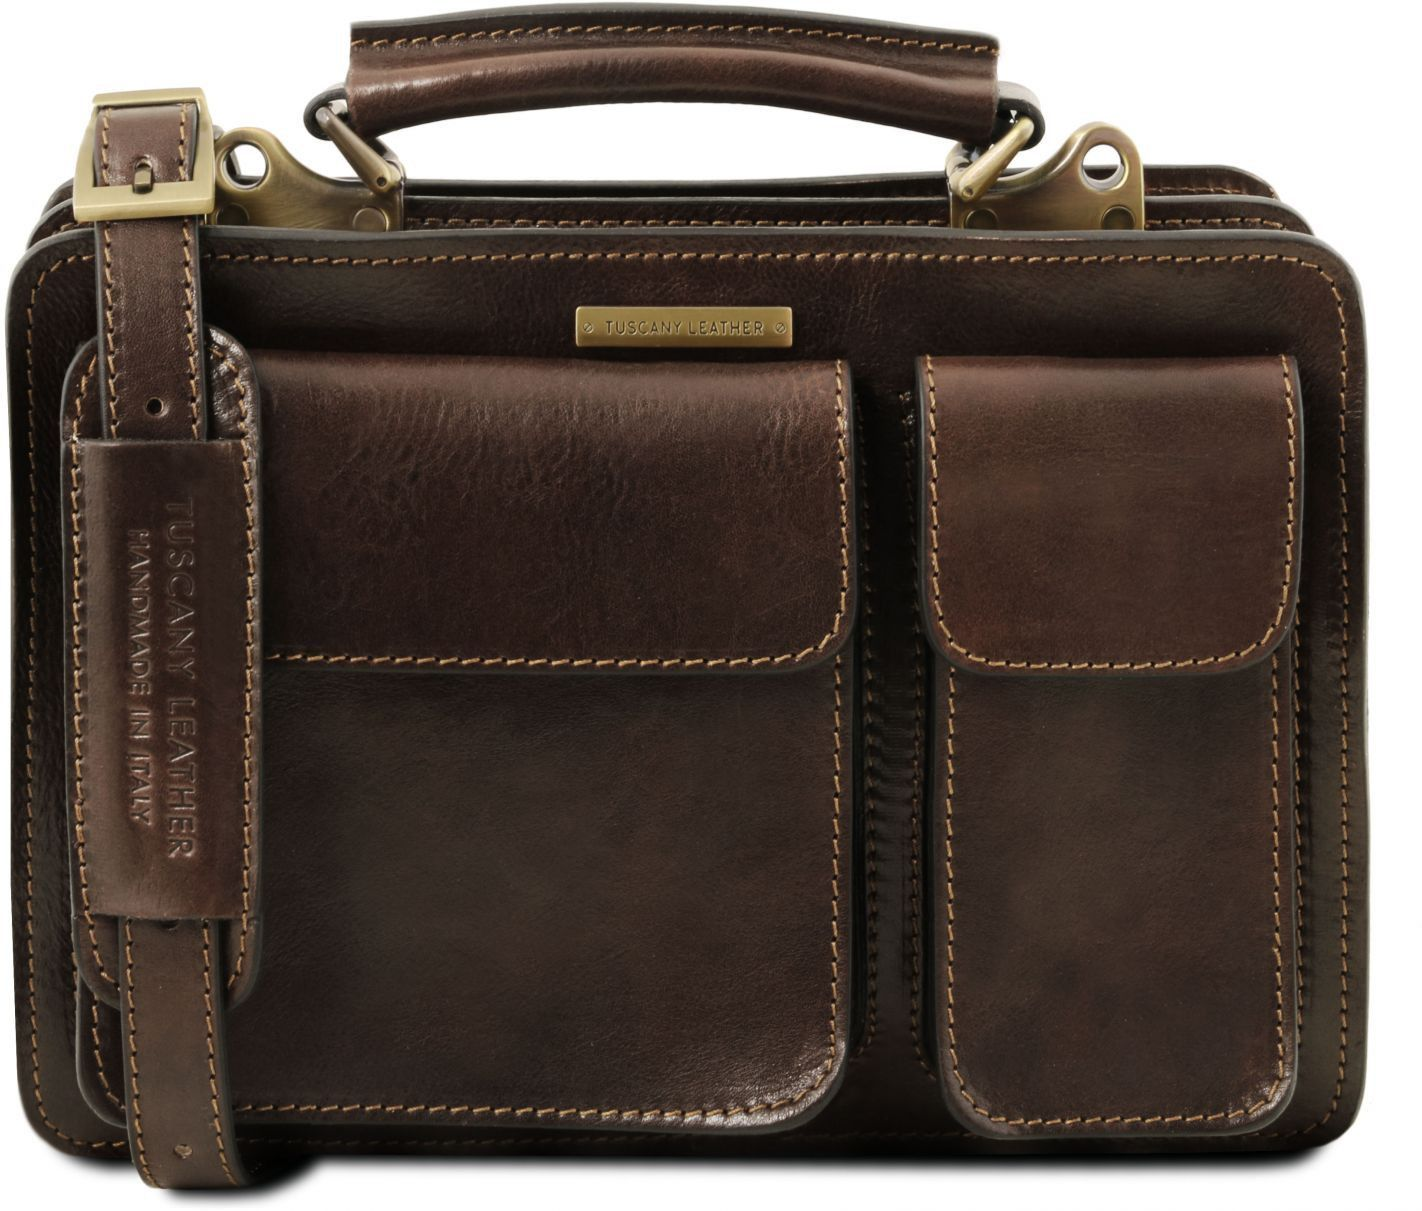 6f146b47da Γυναικεία Επαγγελματική Τσάντα Δερμάτινη Tania S Καφέ σκούρο Tuscany  Leather ...